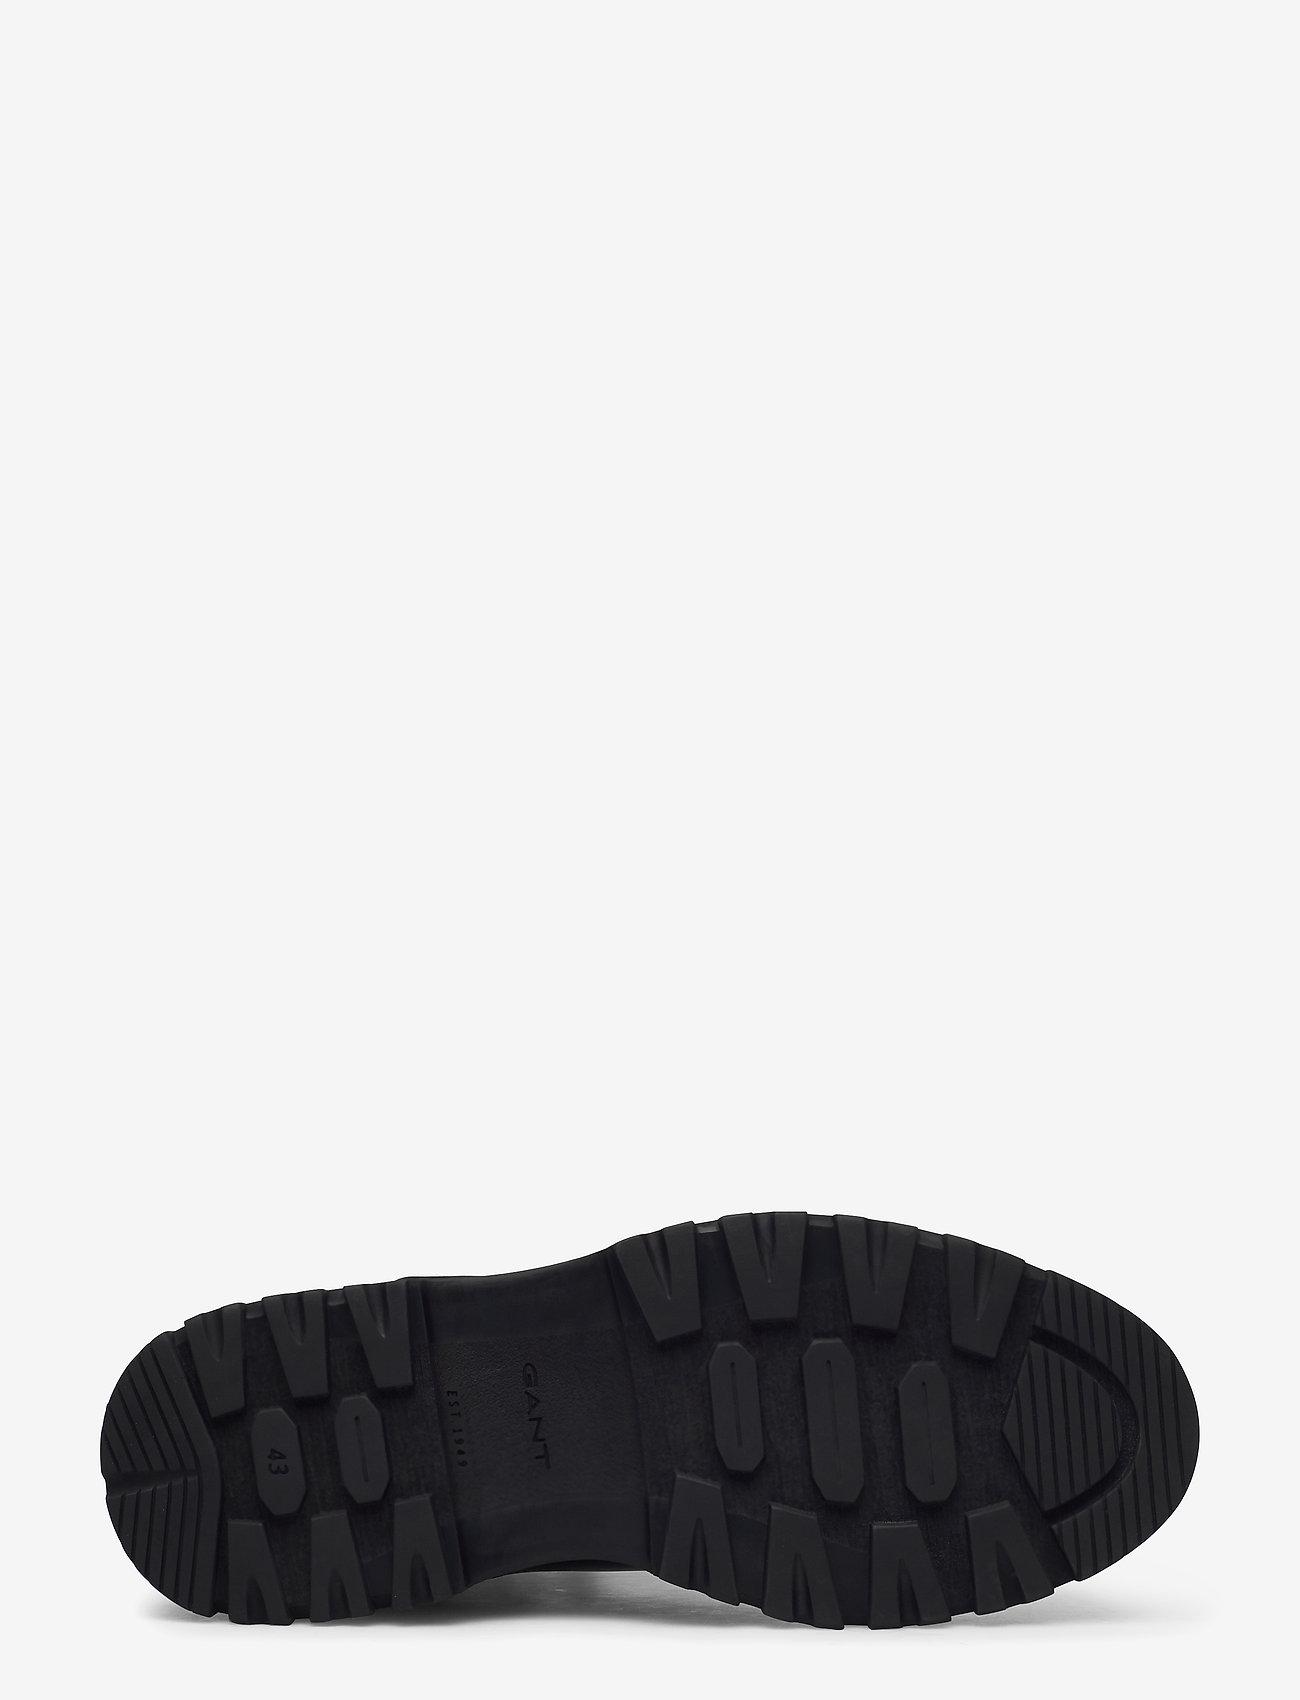 St Grip Chelsea (Black) (159.95 €) - GANT SAgxD